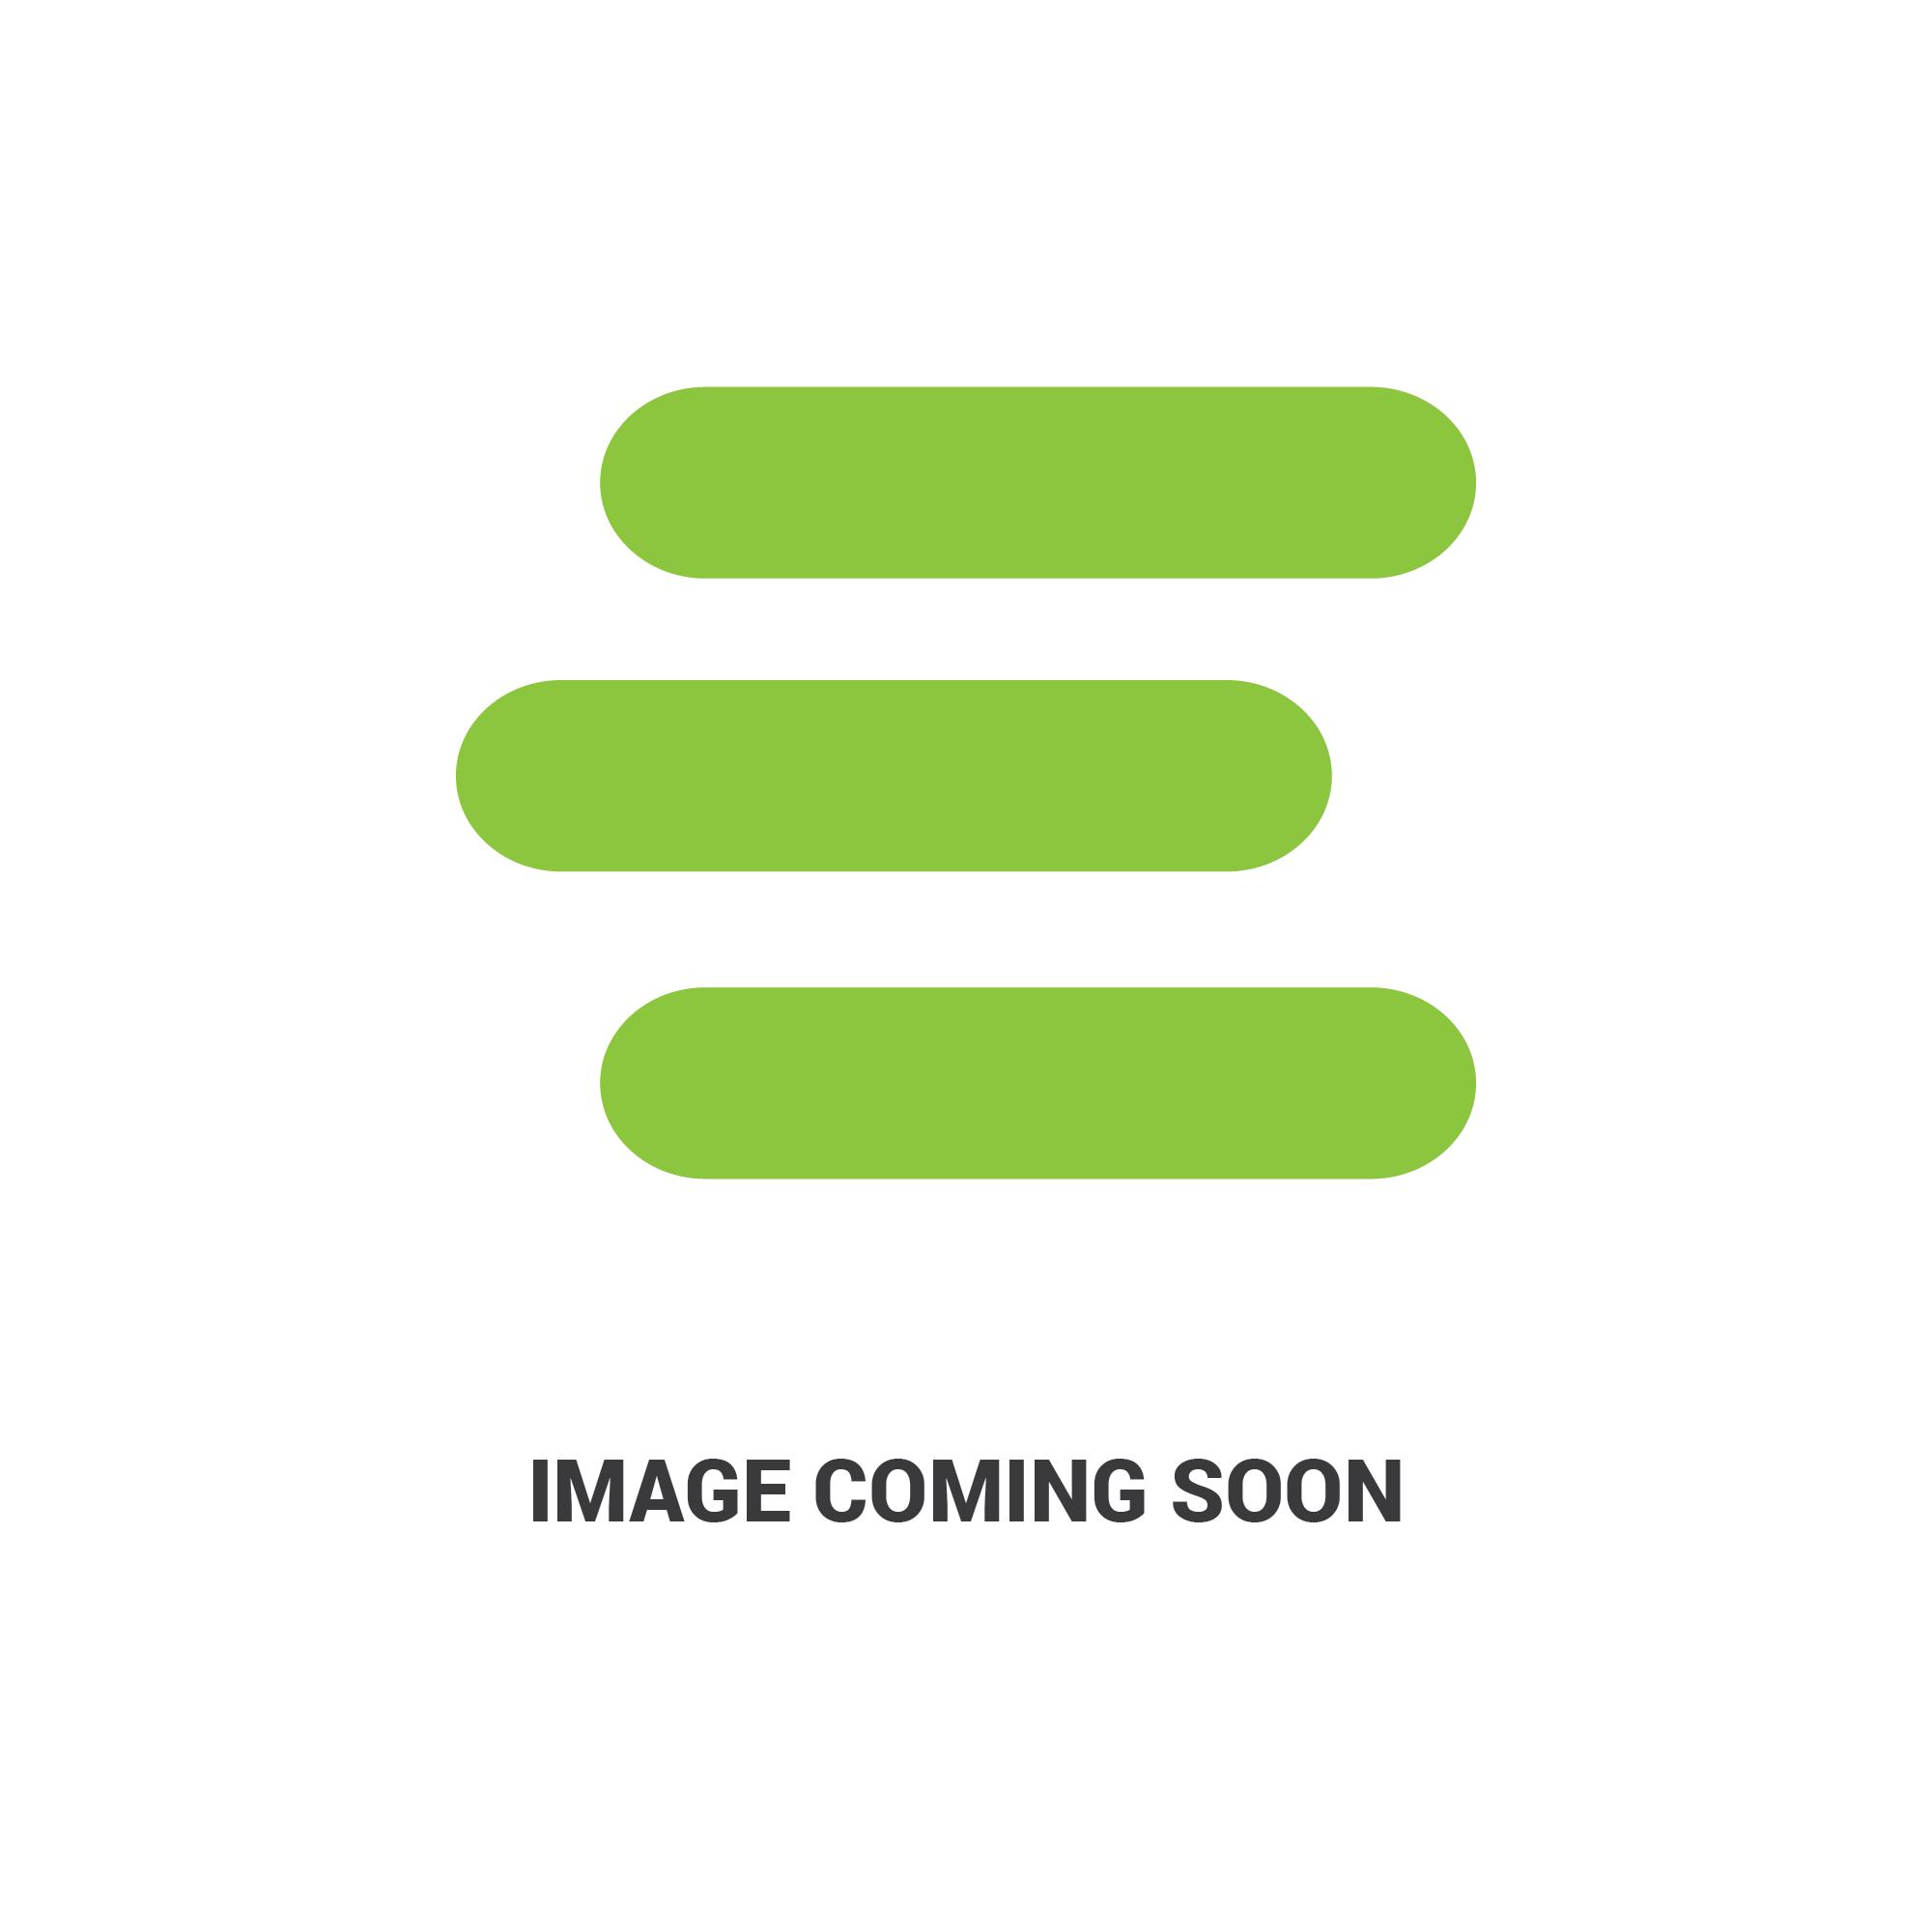 E-6580456edit 1.jpg